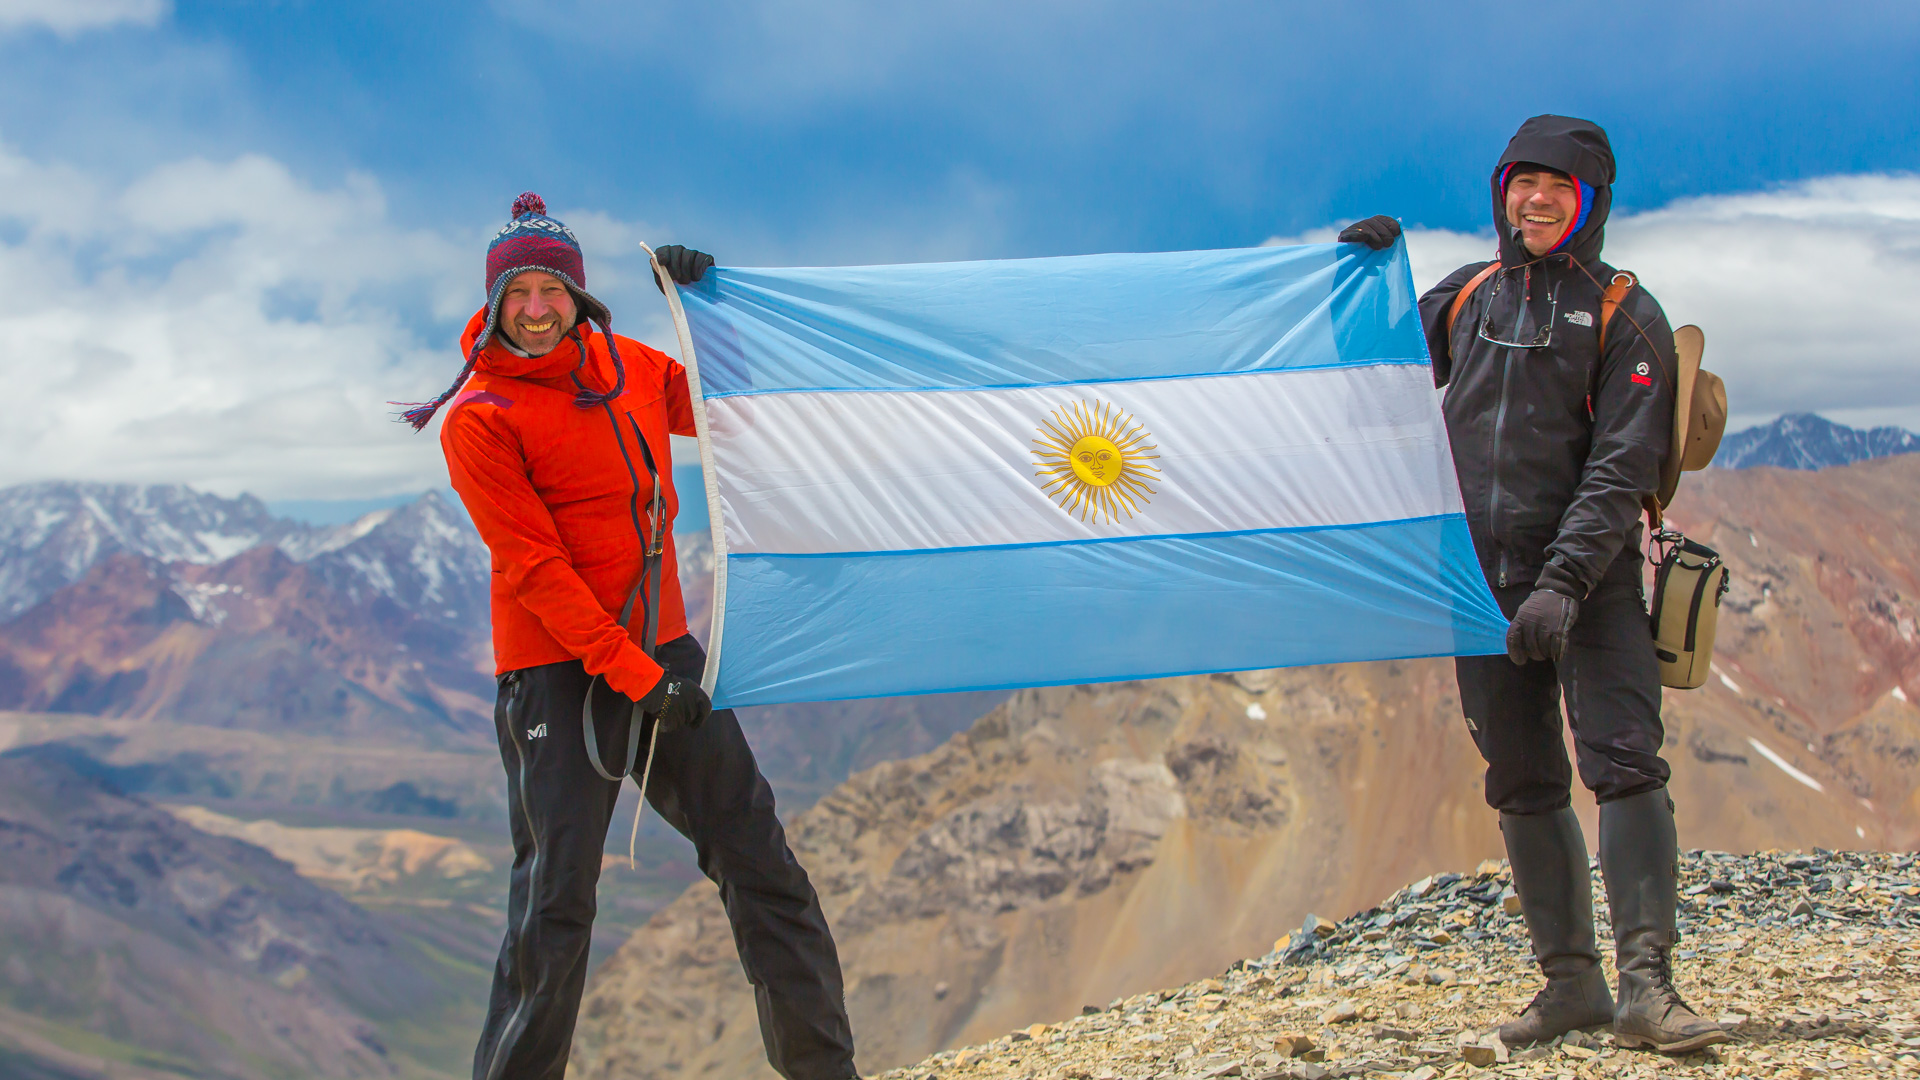 Viva Argentina! Konna wyprawa z Argentyny do Chile